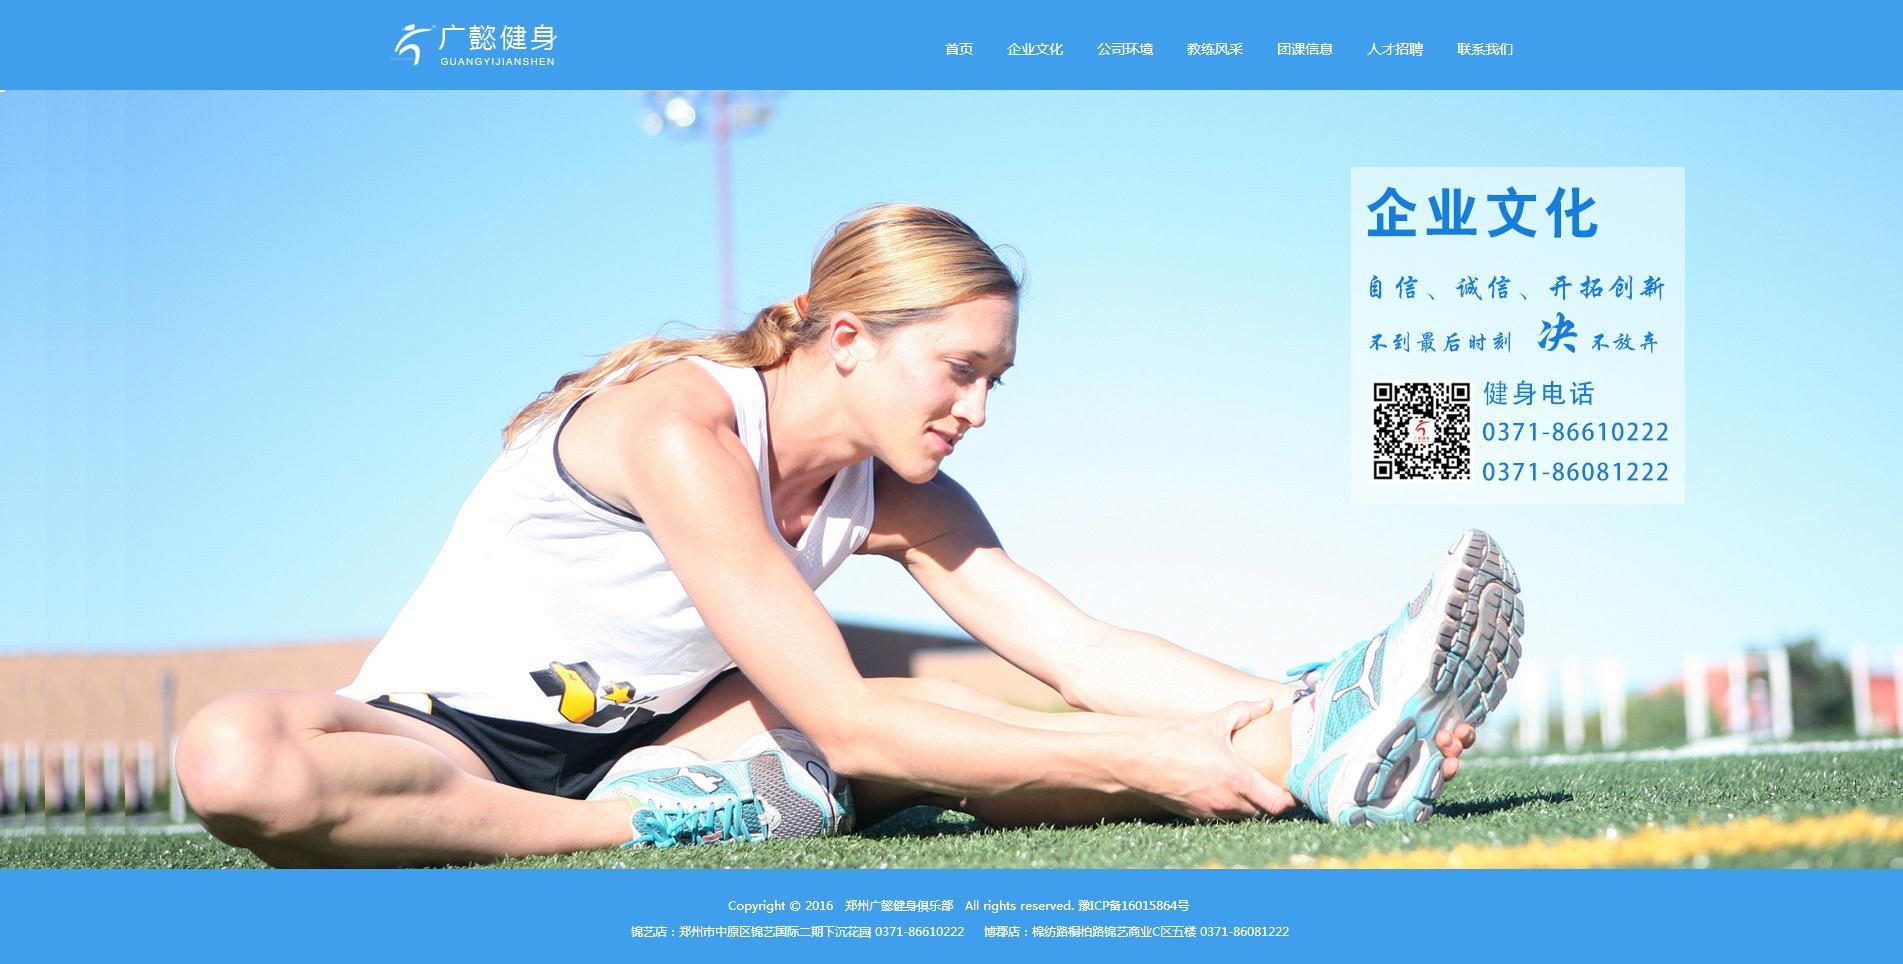 郑州ope官方ope官方ope官方网站下载下载下载建设